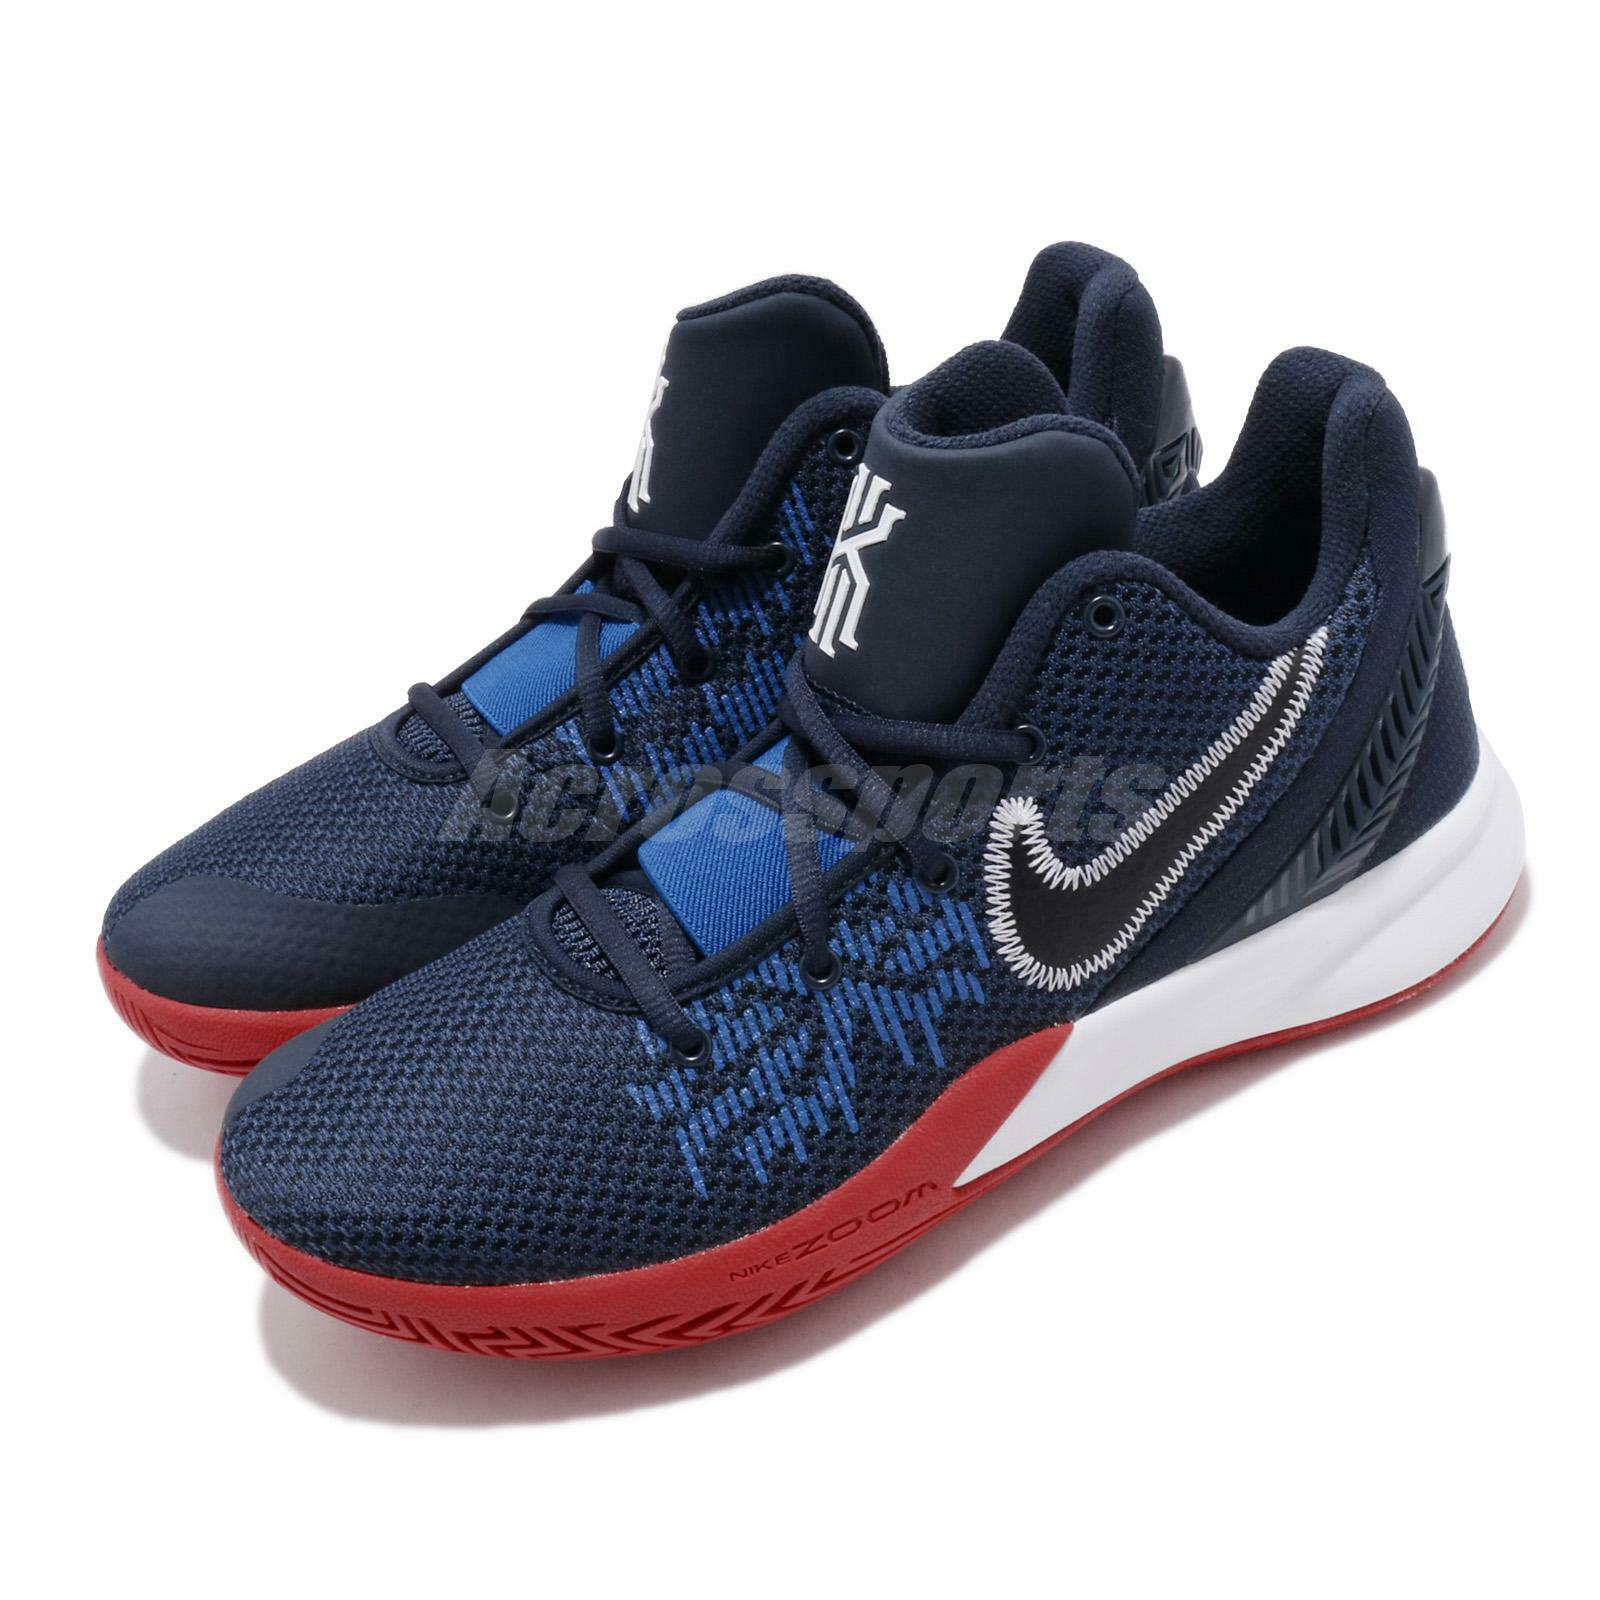 Nike Kyrie Flytrap II EP 2 Irving Navy